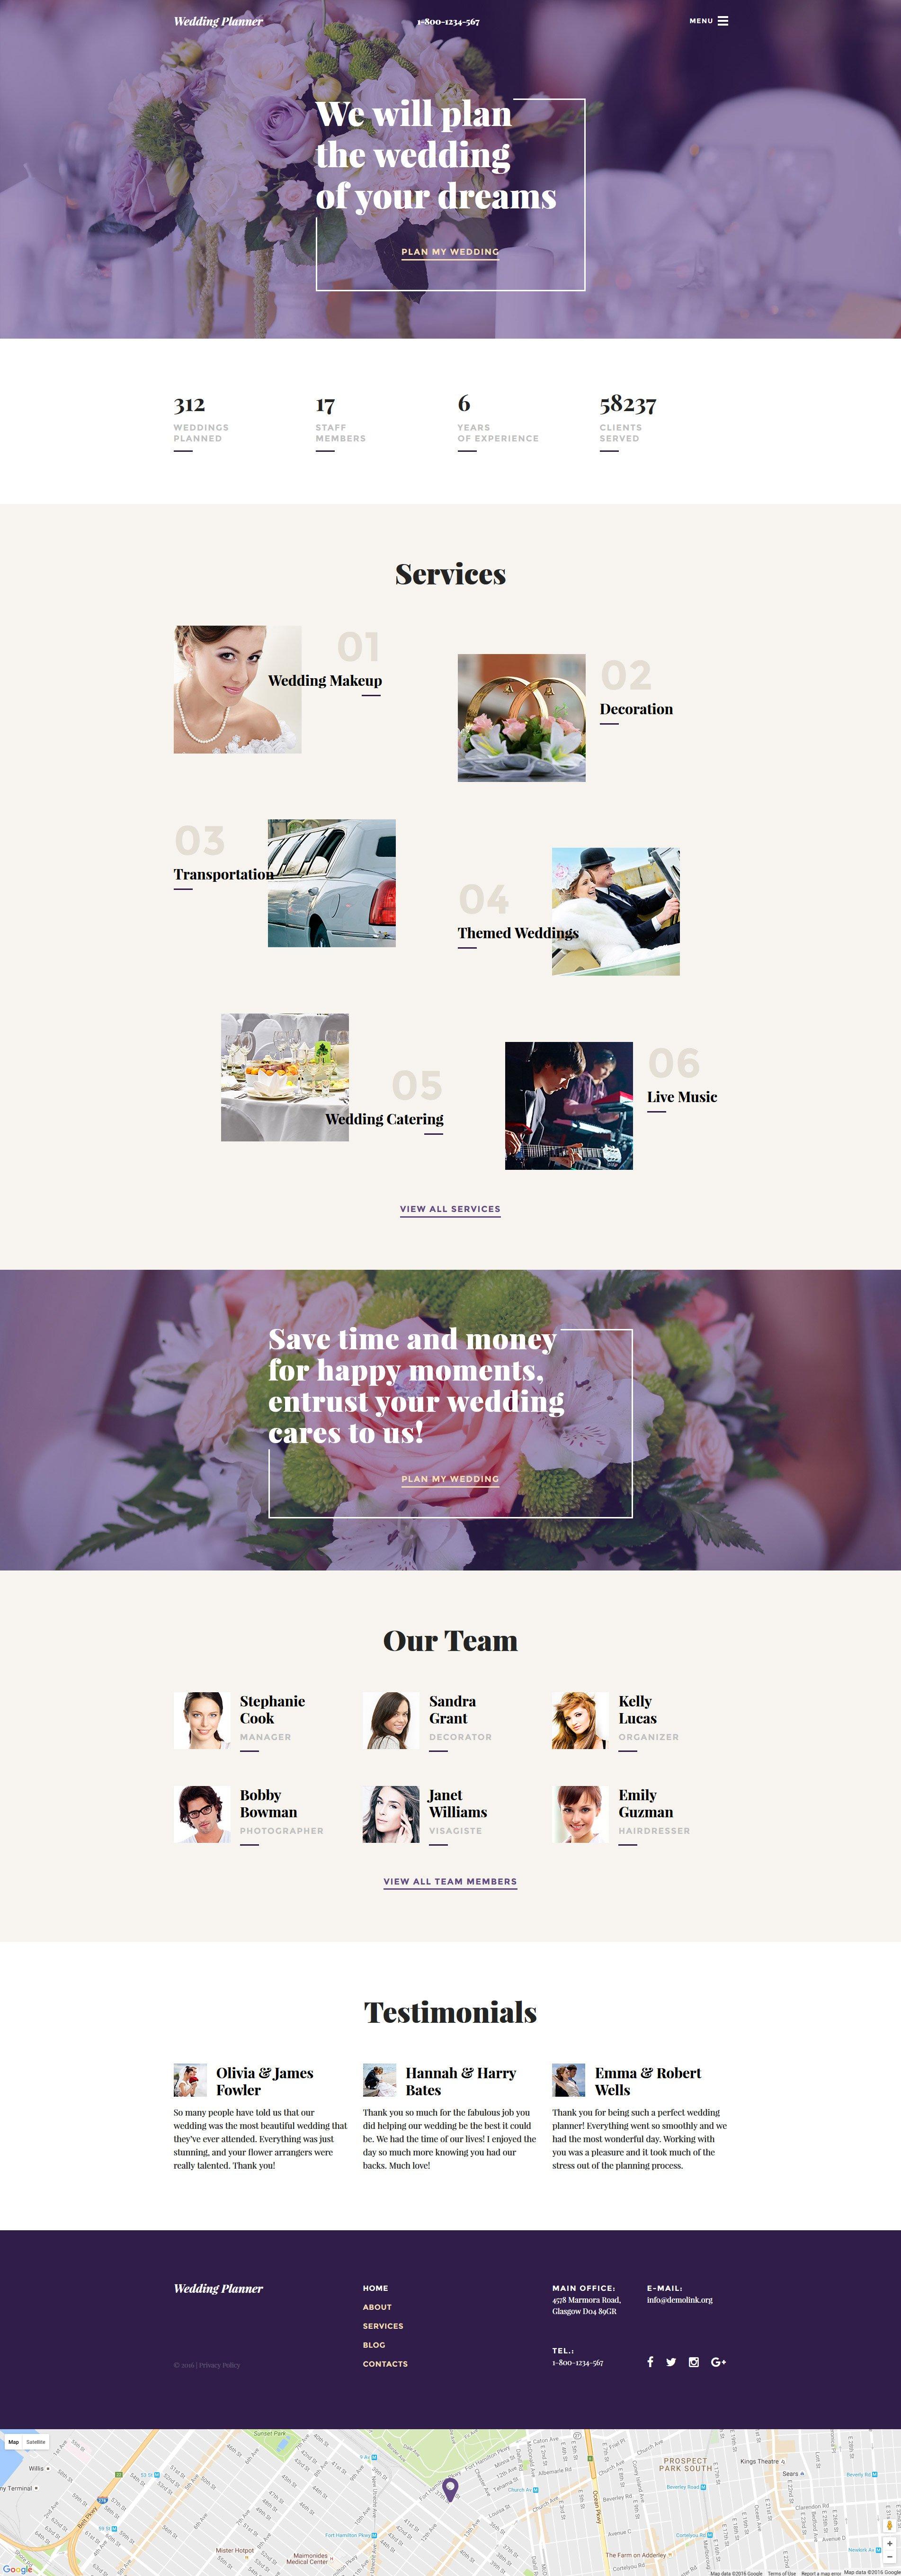 party planner websites